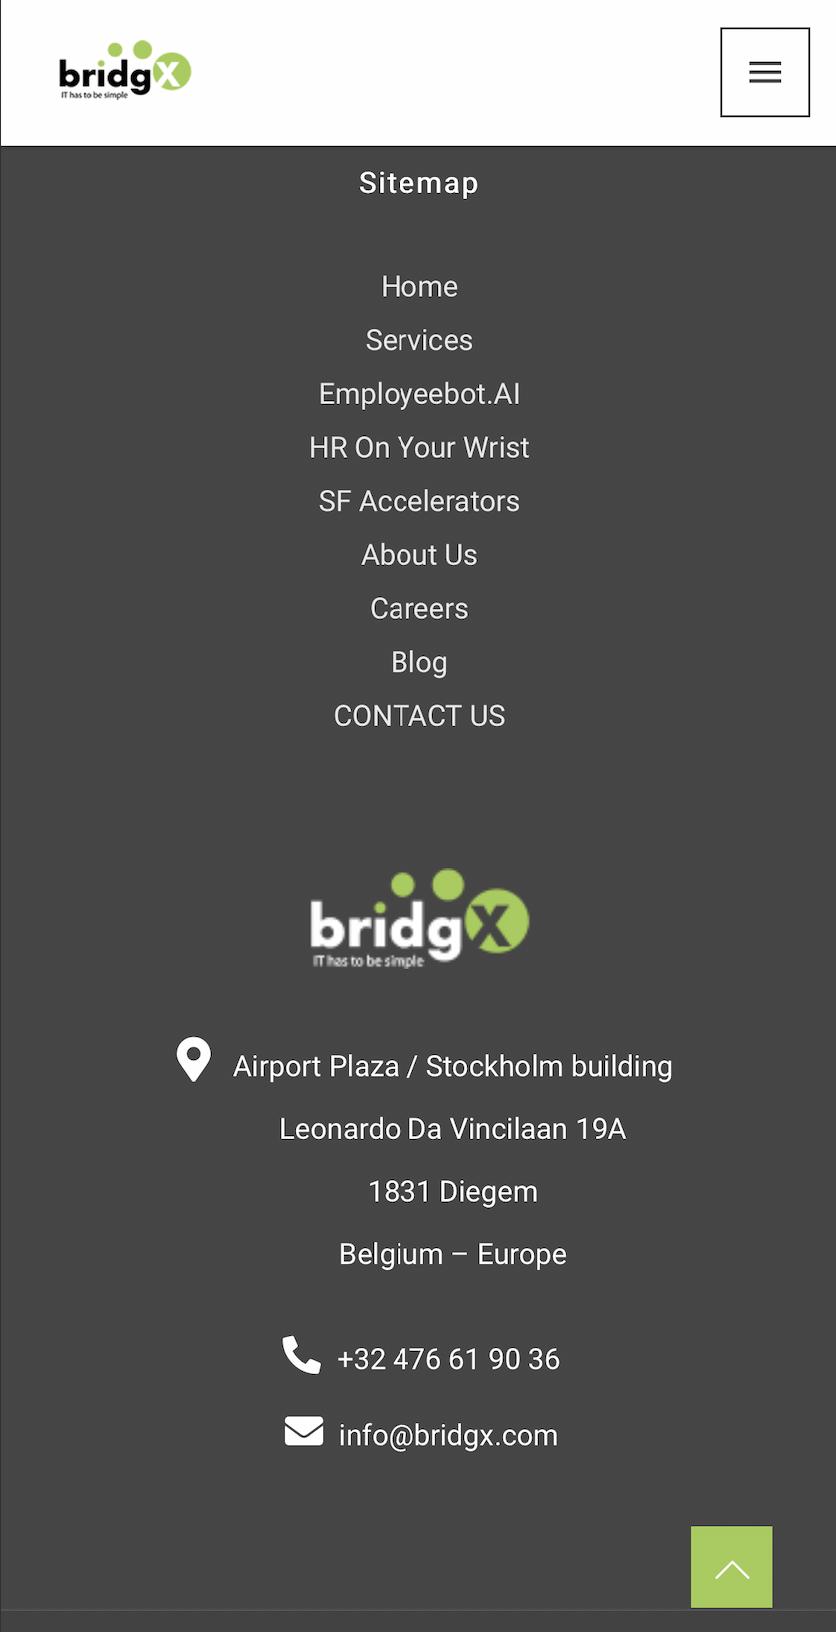 hepto_webdesign_bridgx5